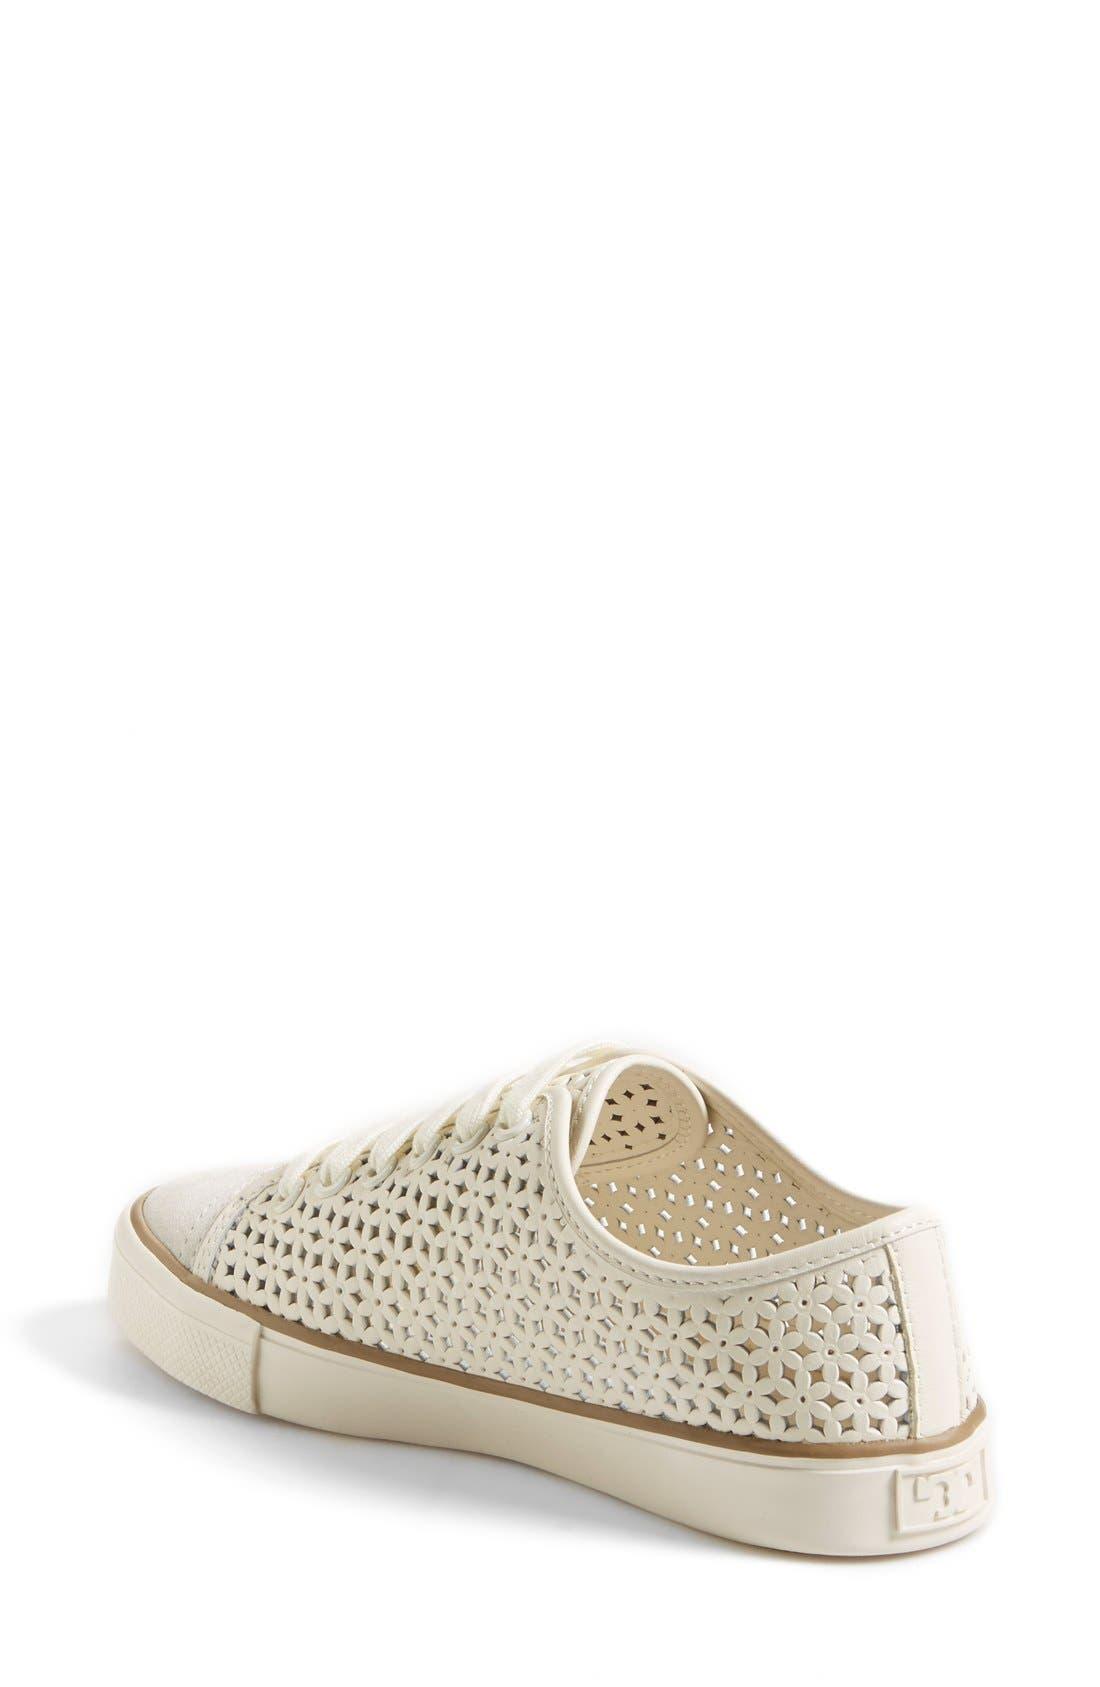 Alternate Image 2  - Tory Burch 'Daisy' Perforated Sneaker (Women)